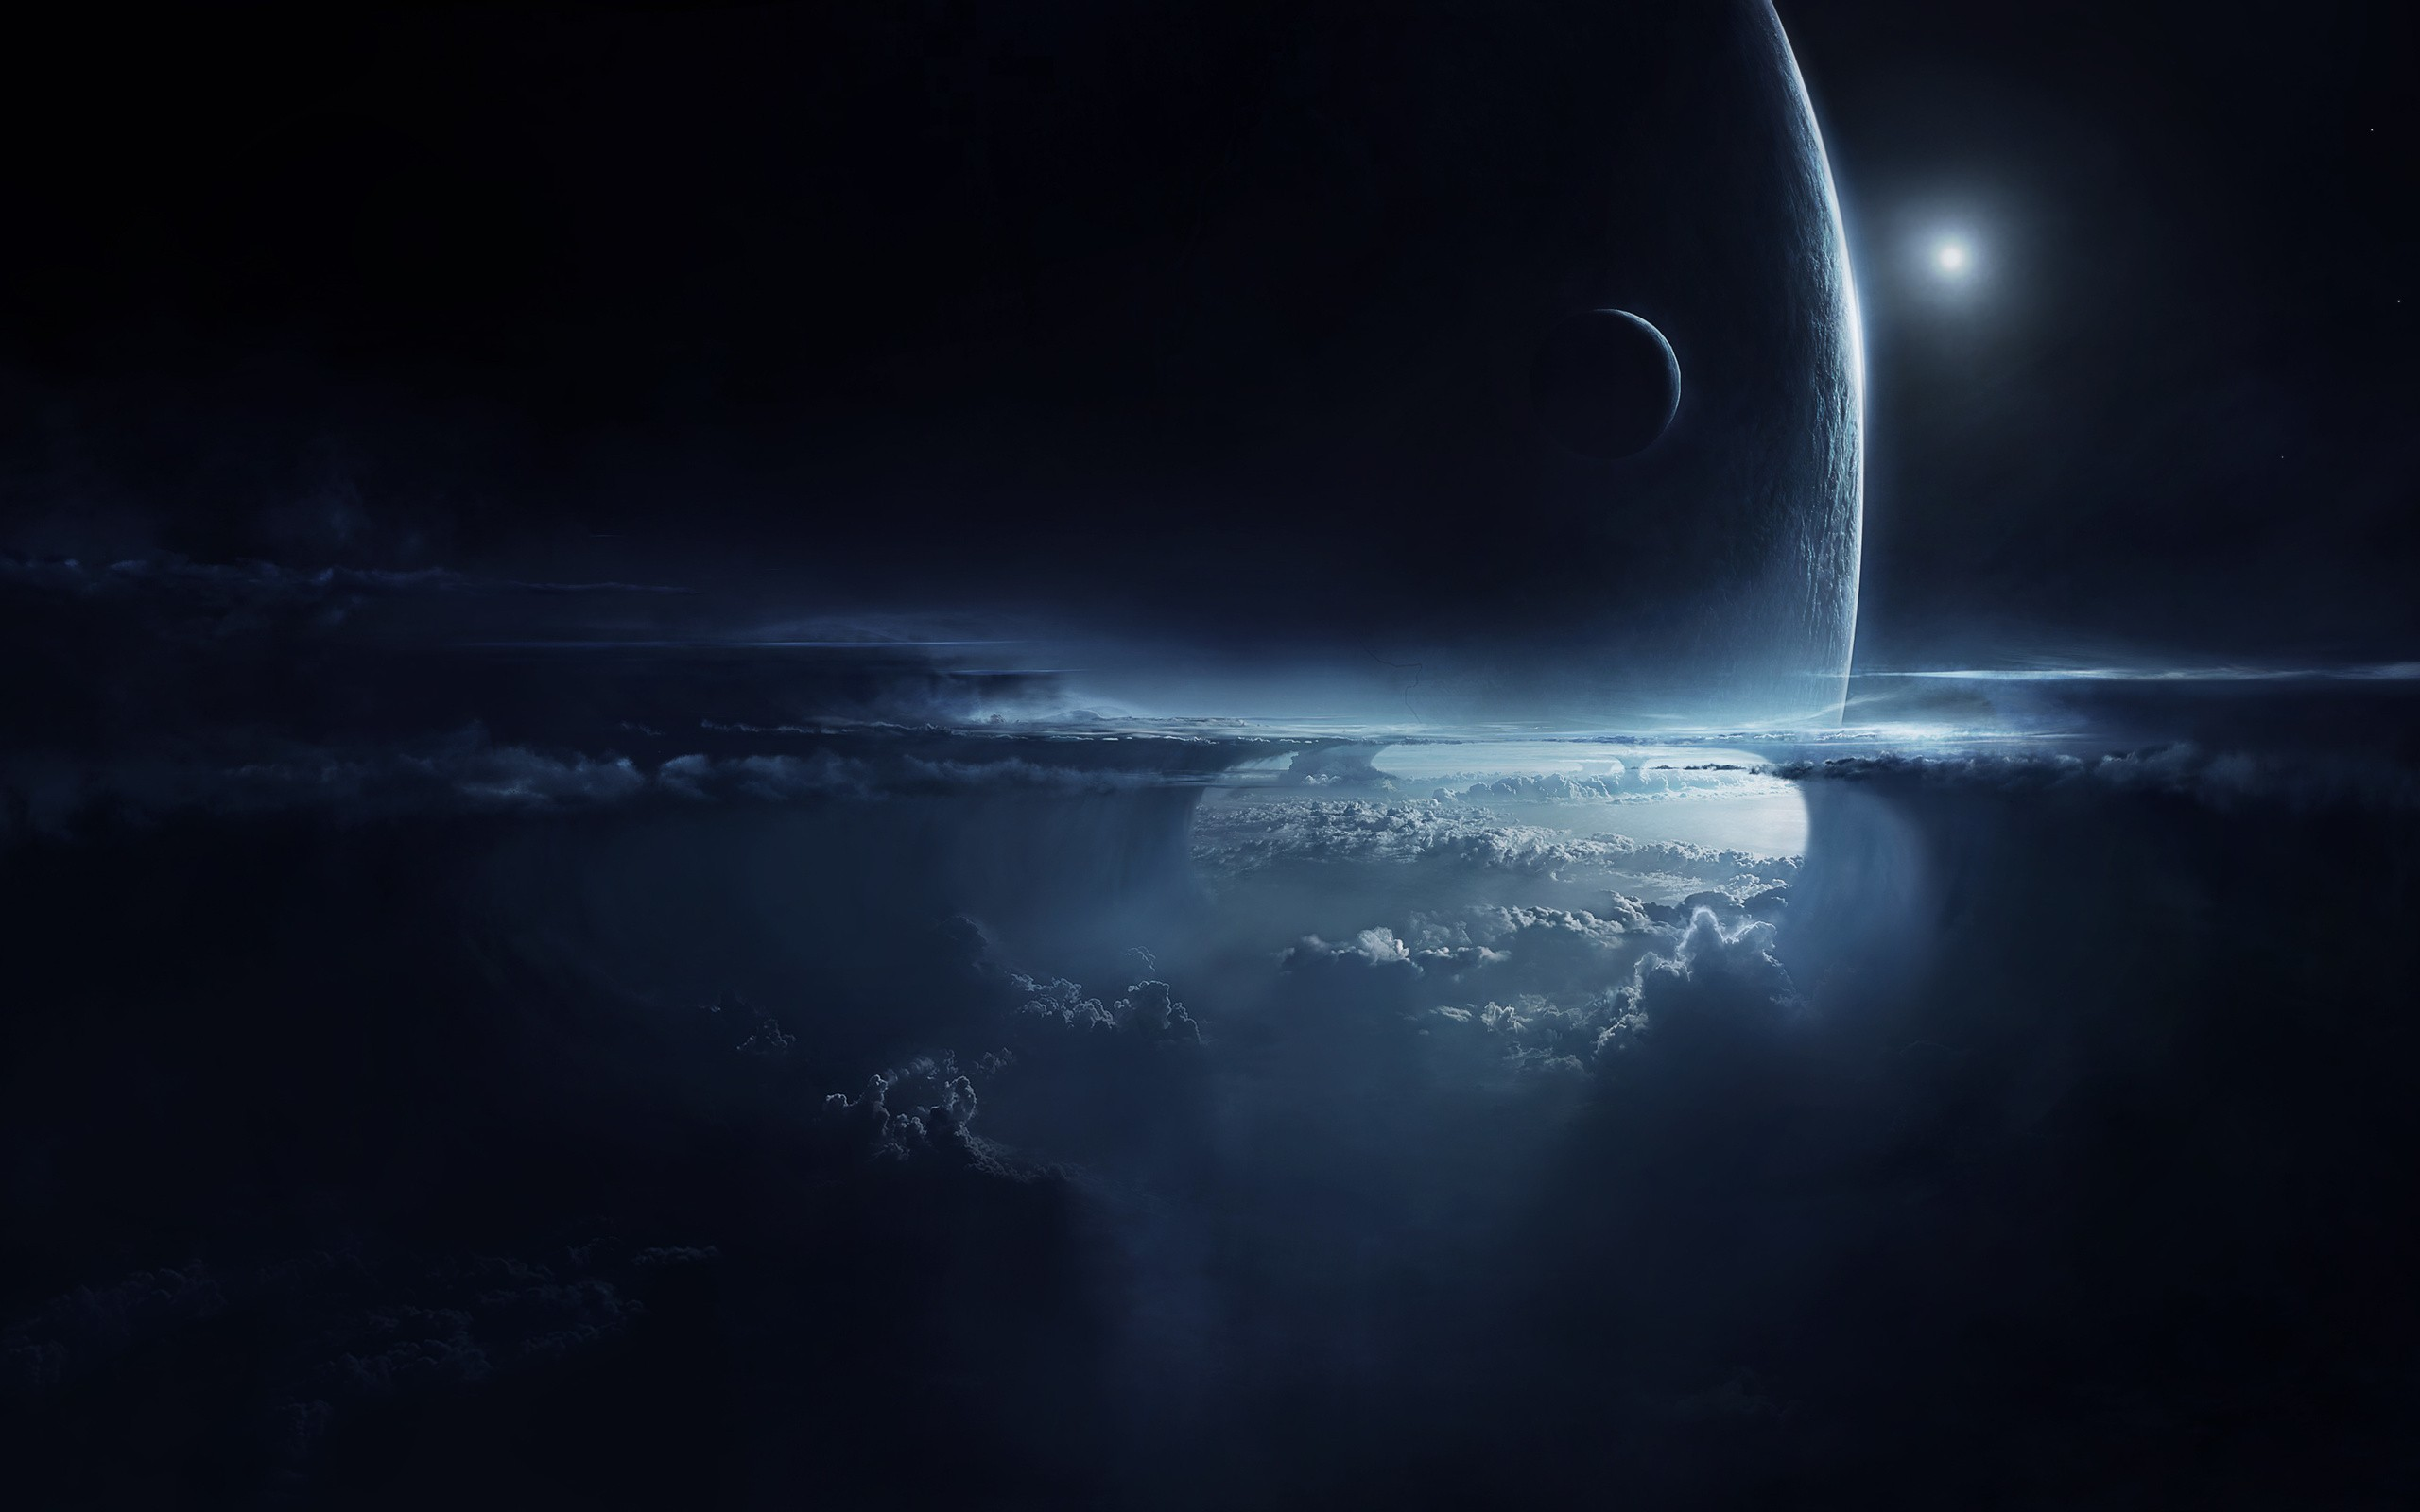 Explore and share Dark Space Wallpaper